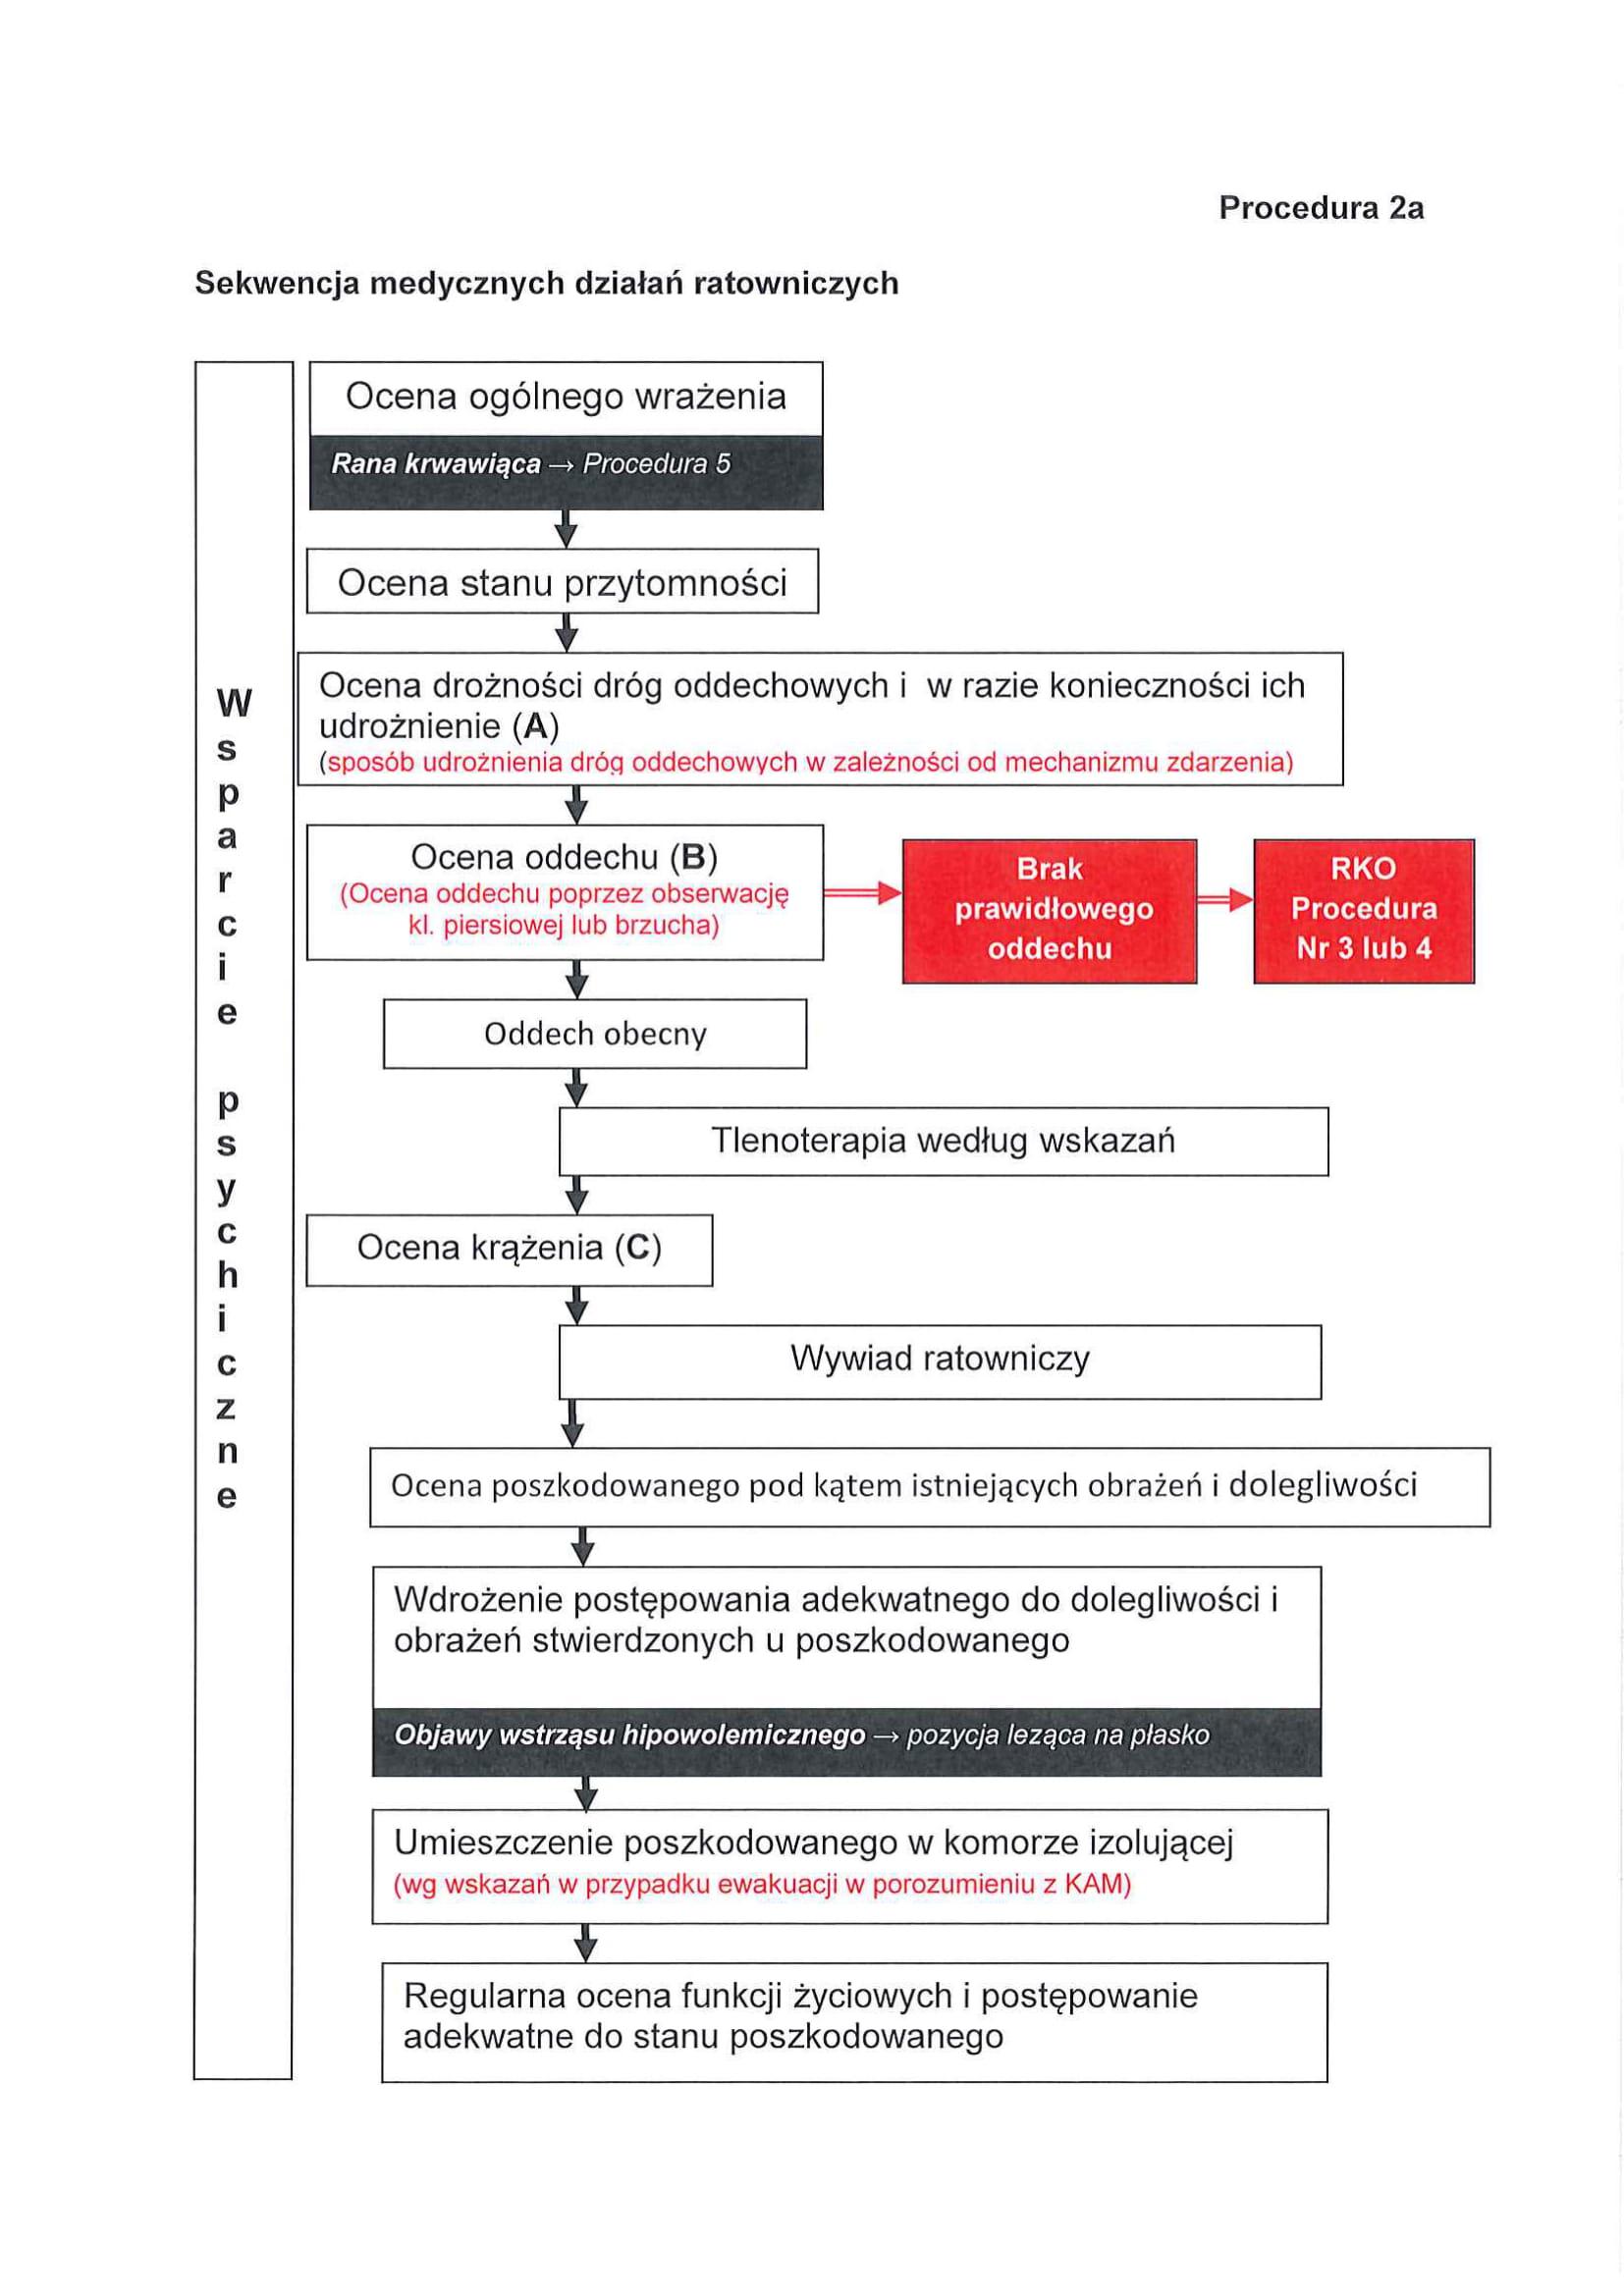 Nowe procedury KPP: 1a i 2a. Co nowego?